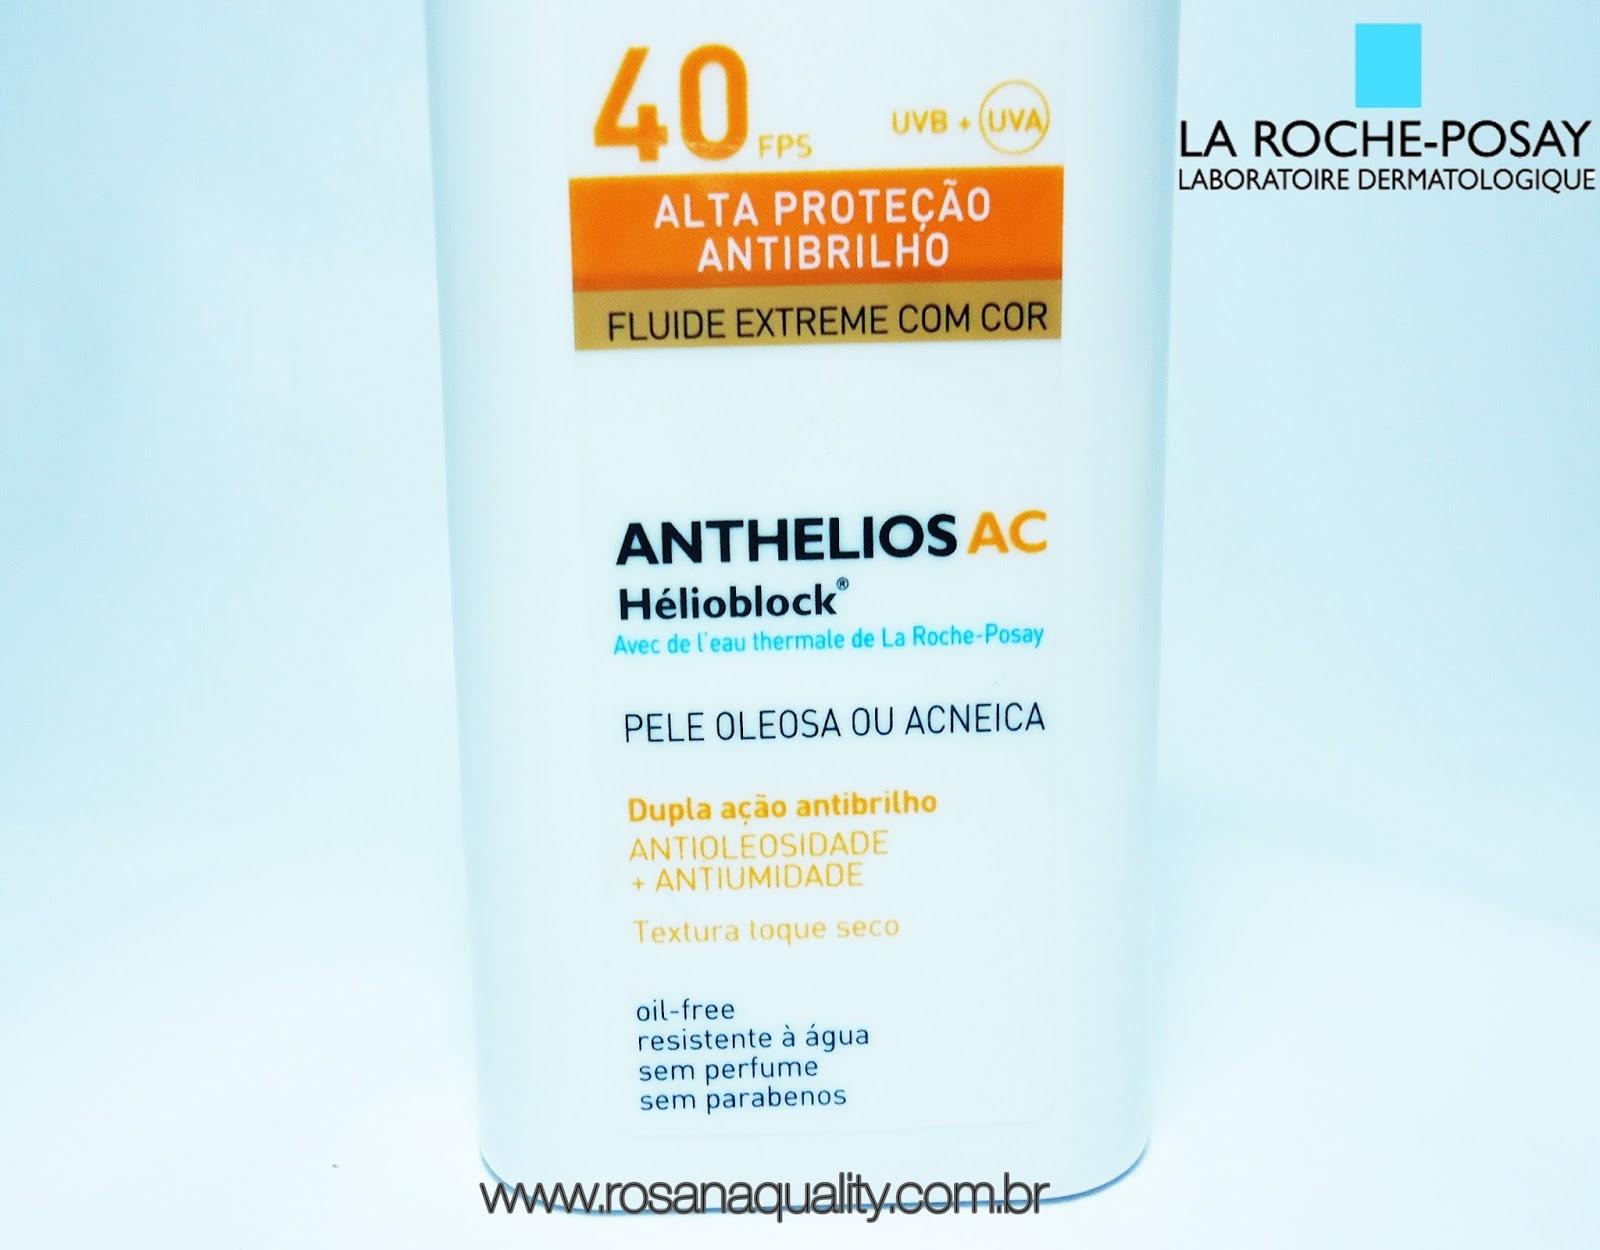 Anthelios AC Hélioblock 40 FPS